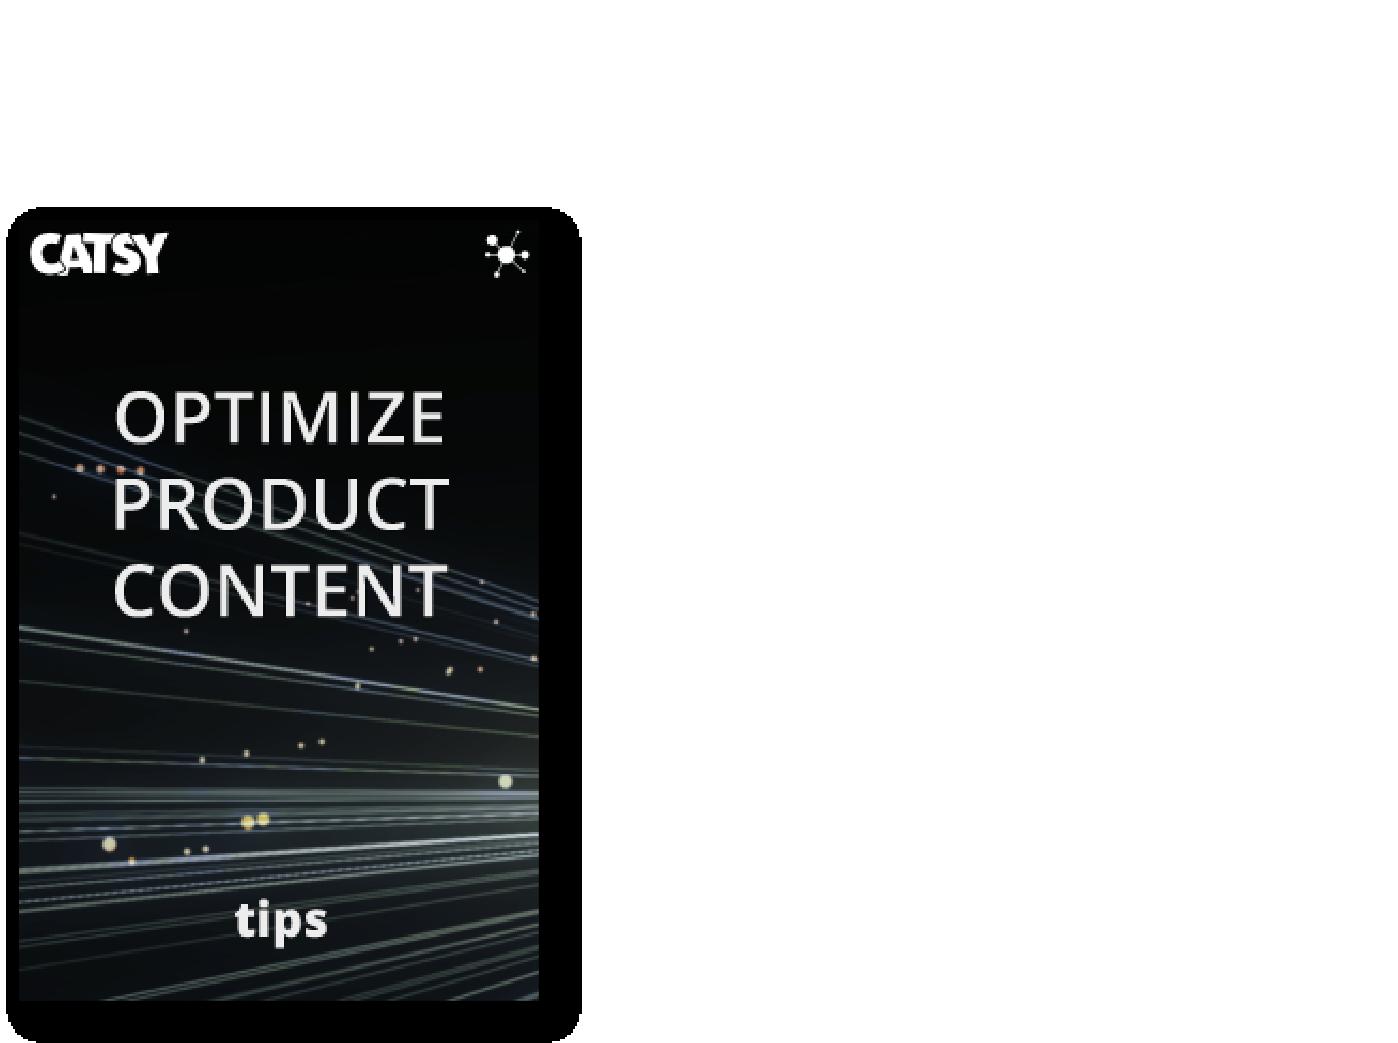 optimize product content